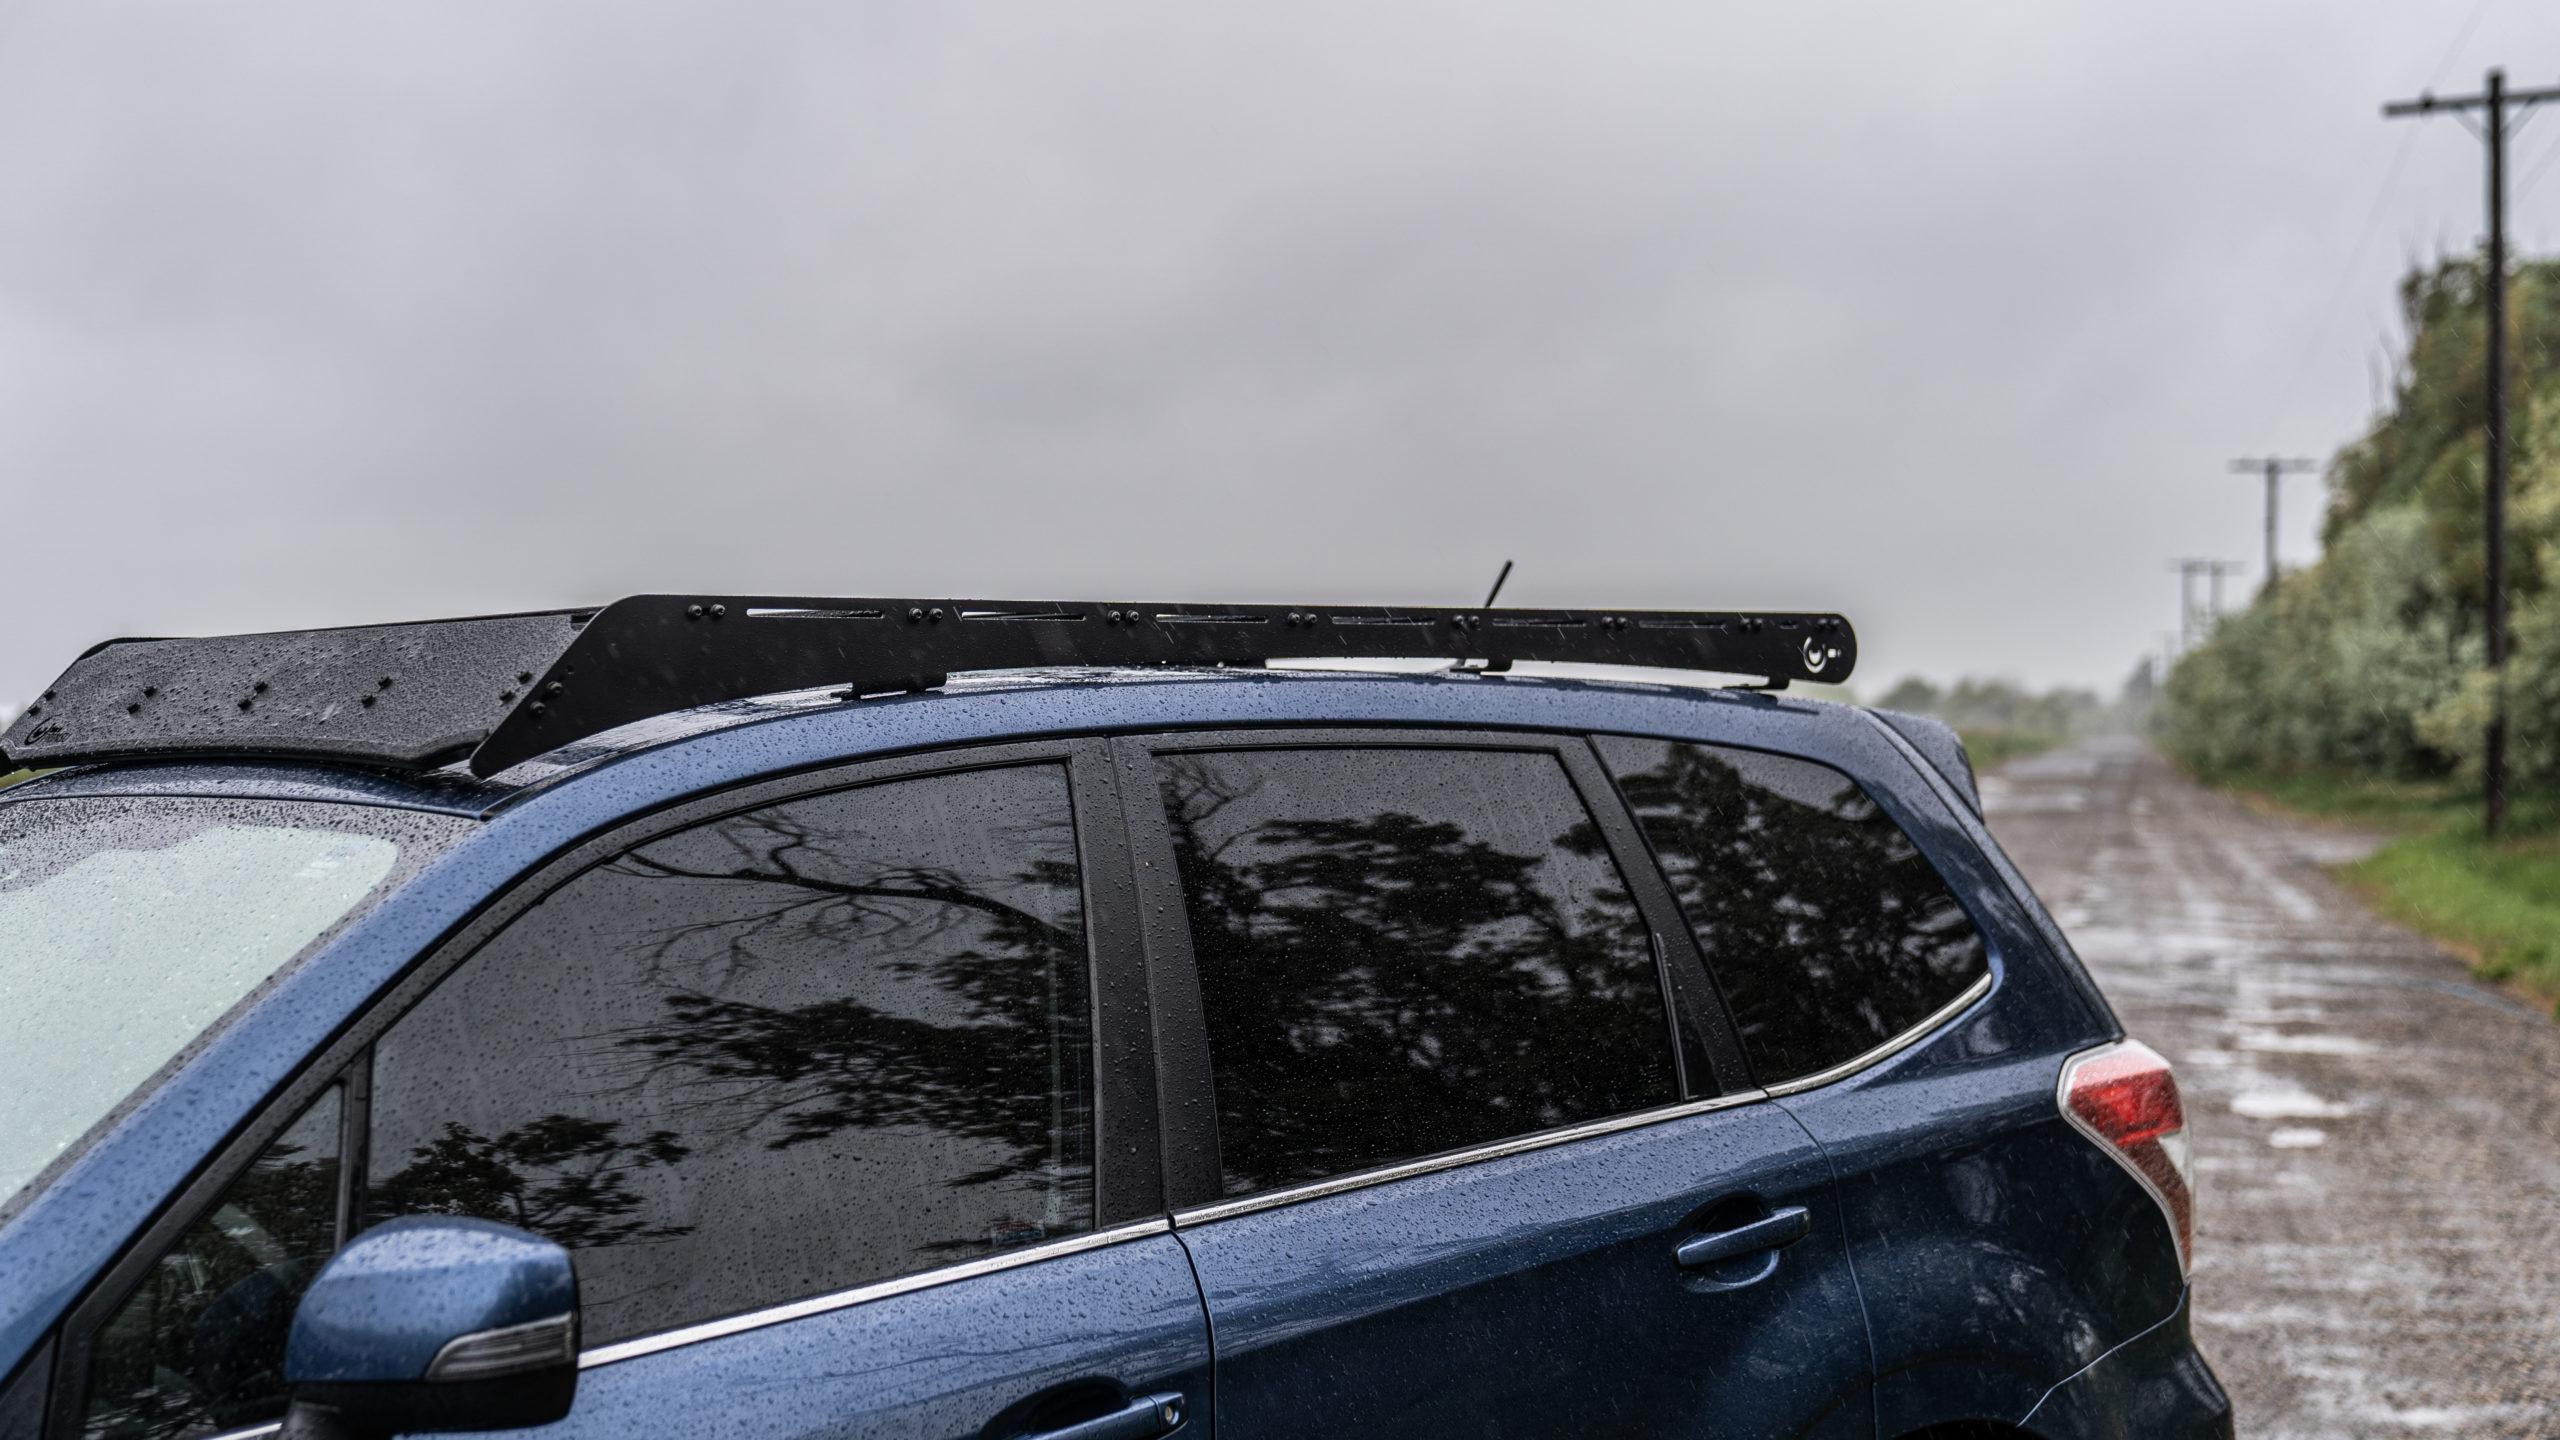 Cbi Offroad Fab 4th Gen Subaru Forester Roof Rack 2014 2018